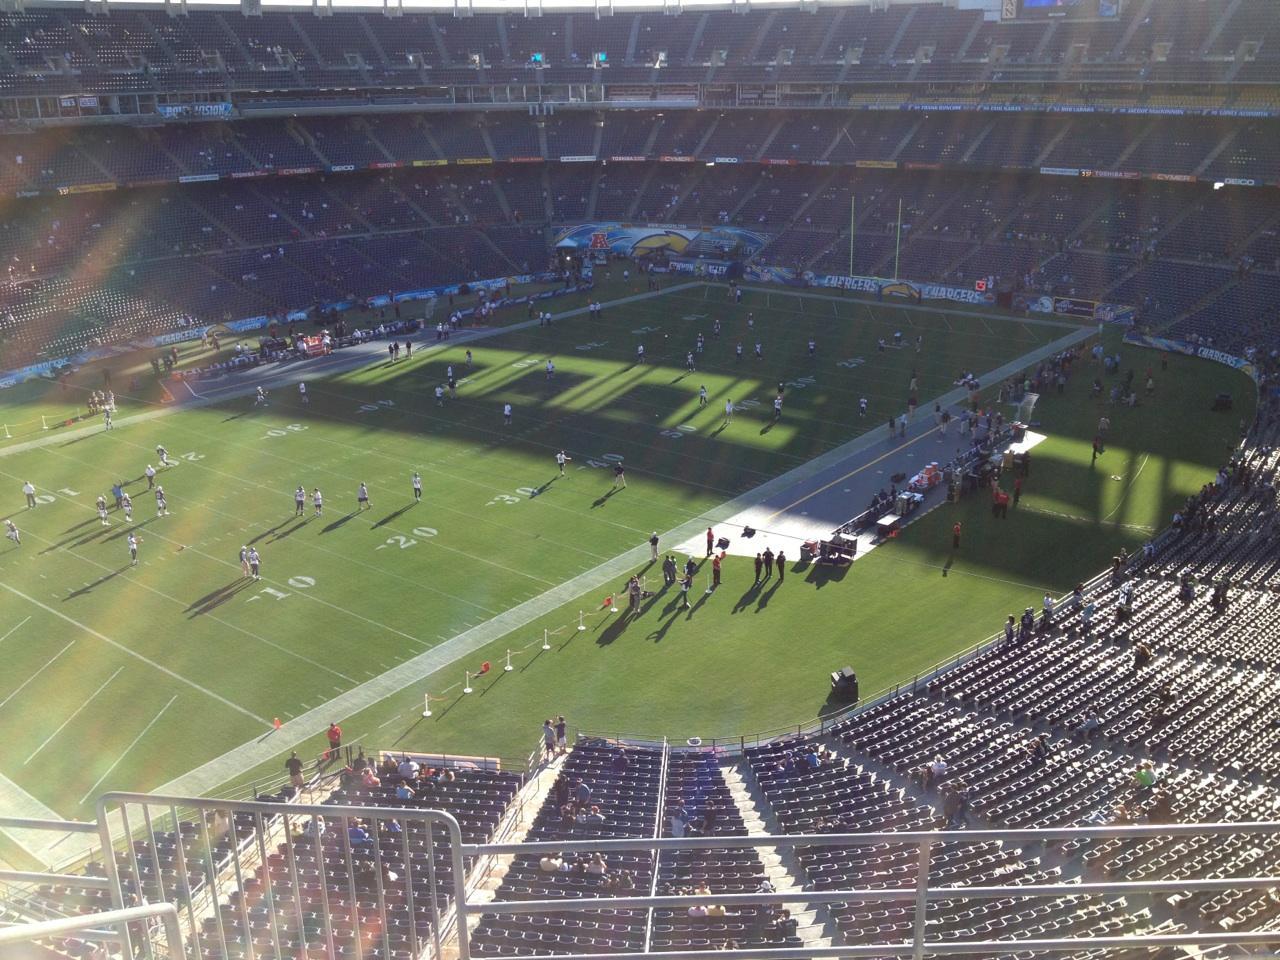 San Diego Stadium Section V59 Row 5 Seat 6